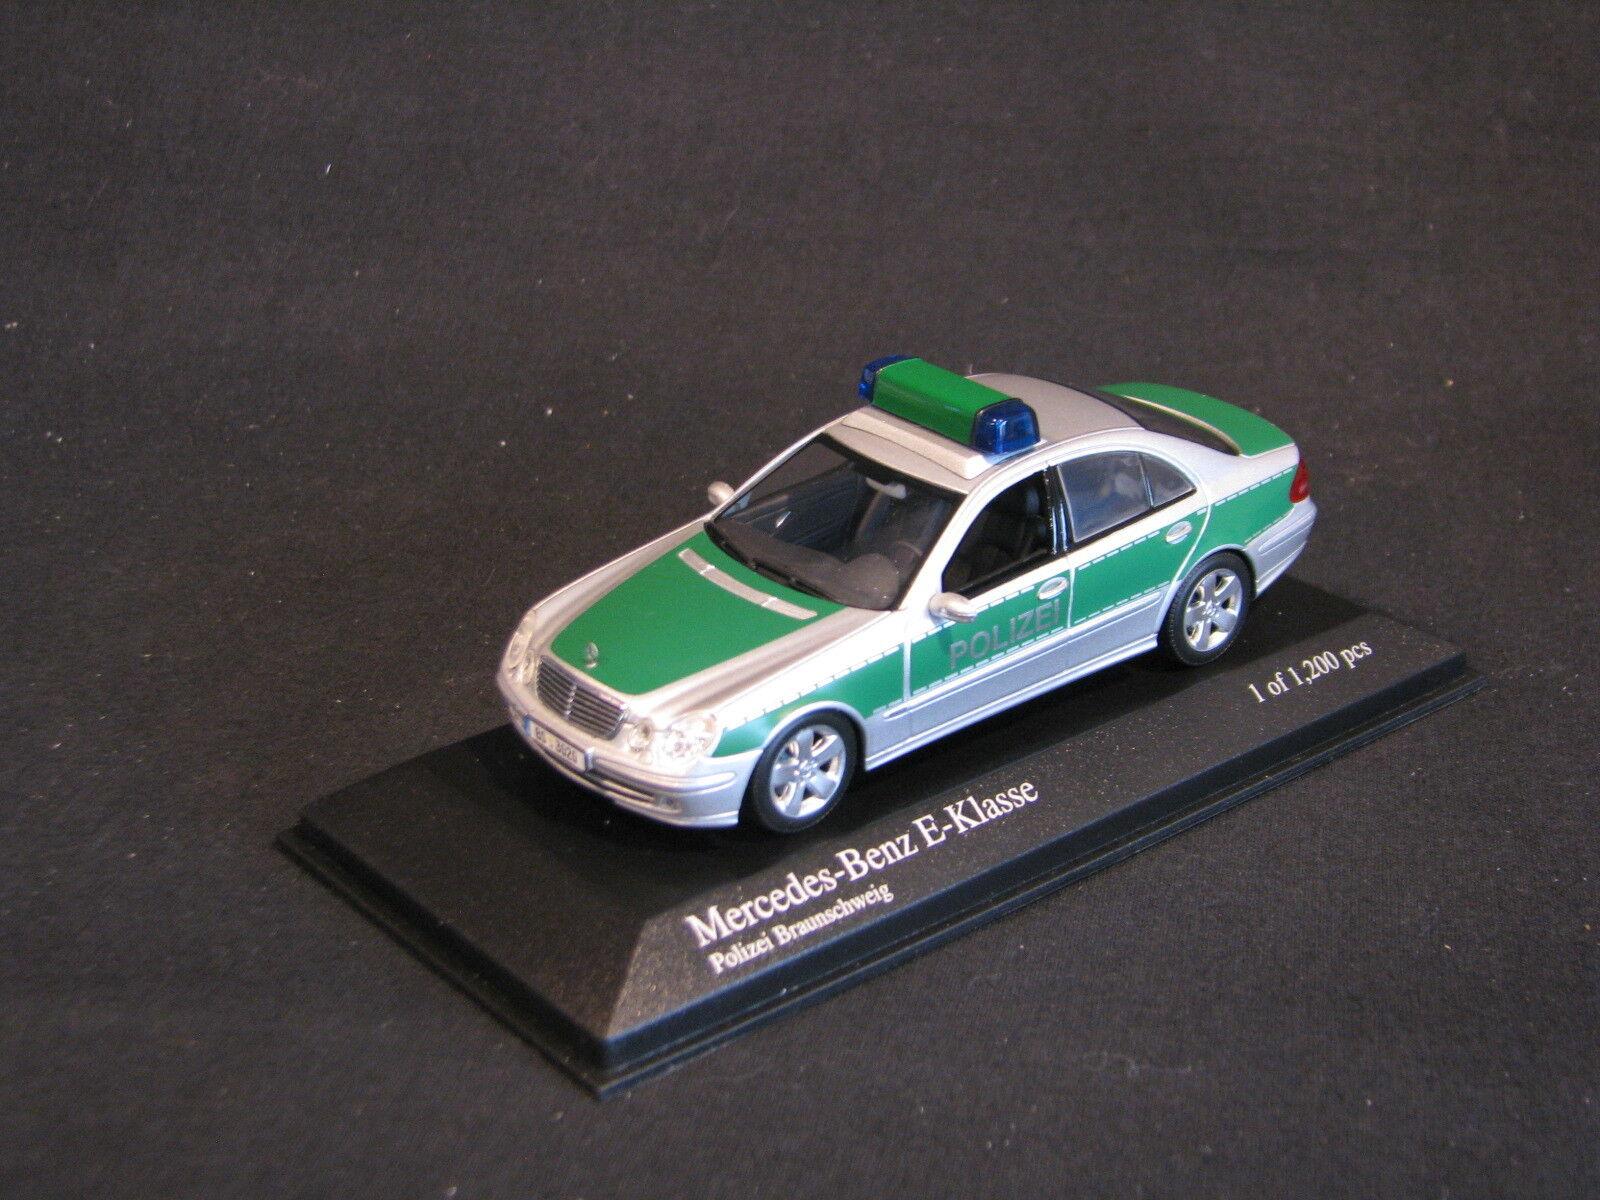 Minichamps Mercedes-Benz E-Klasse 2004 1 43 Polizei brownschweig (GER) (JS)